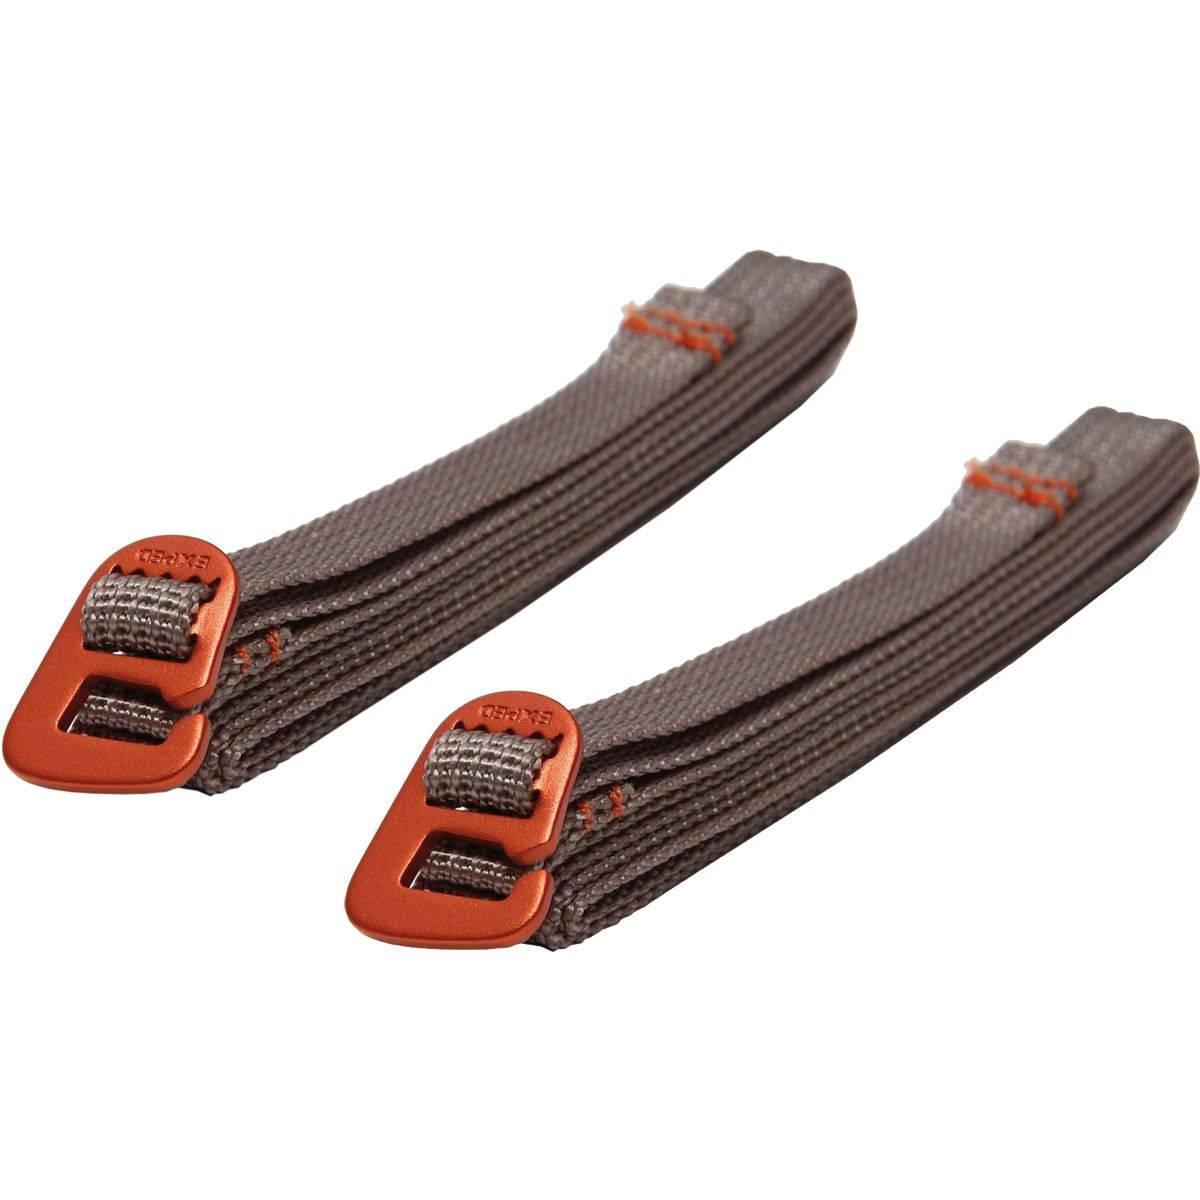 EXPED Accessory Strap UL 20 mm - 120 cm - Spanngurte - Bild 1